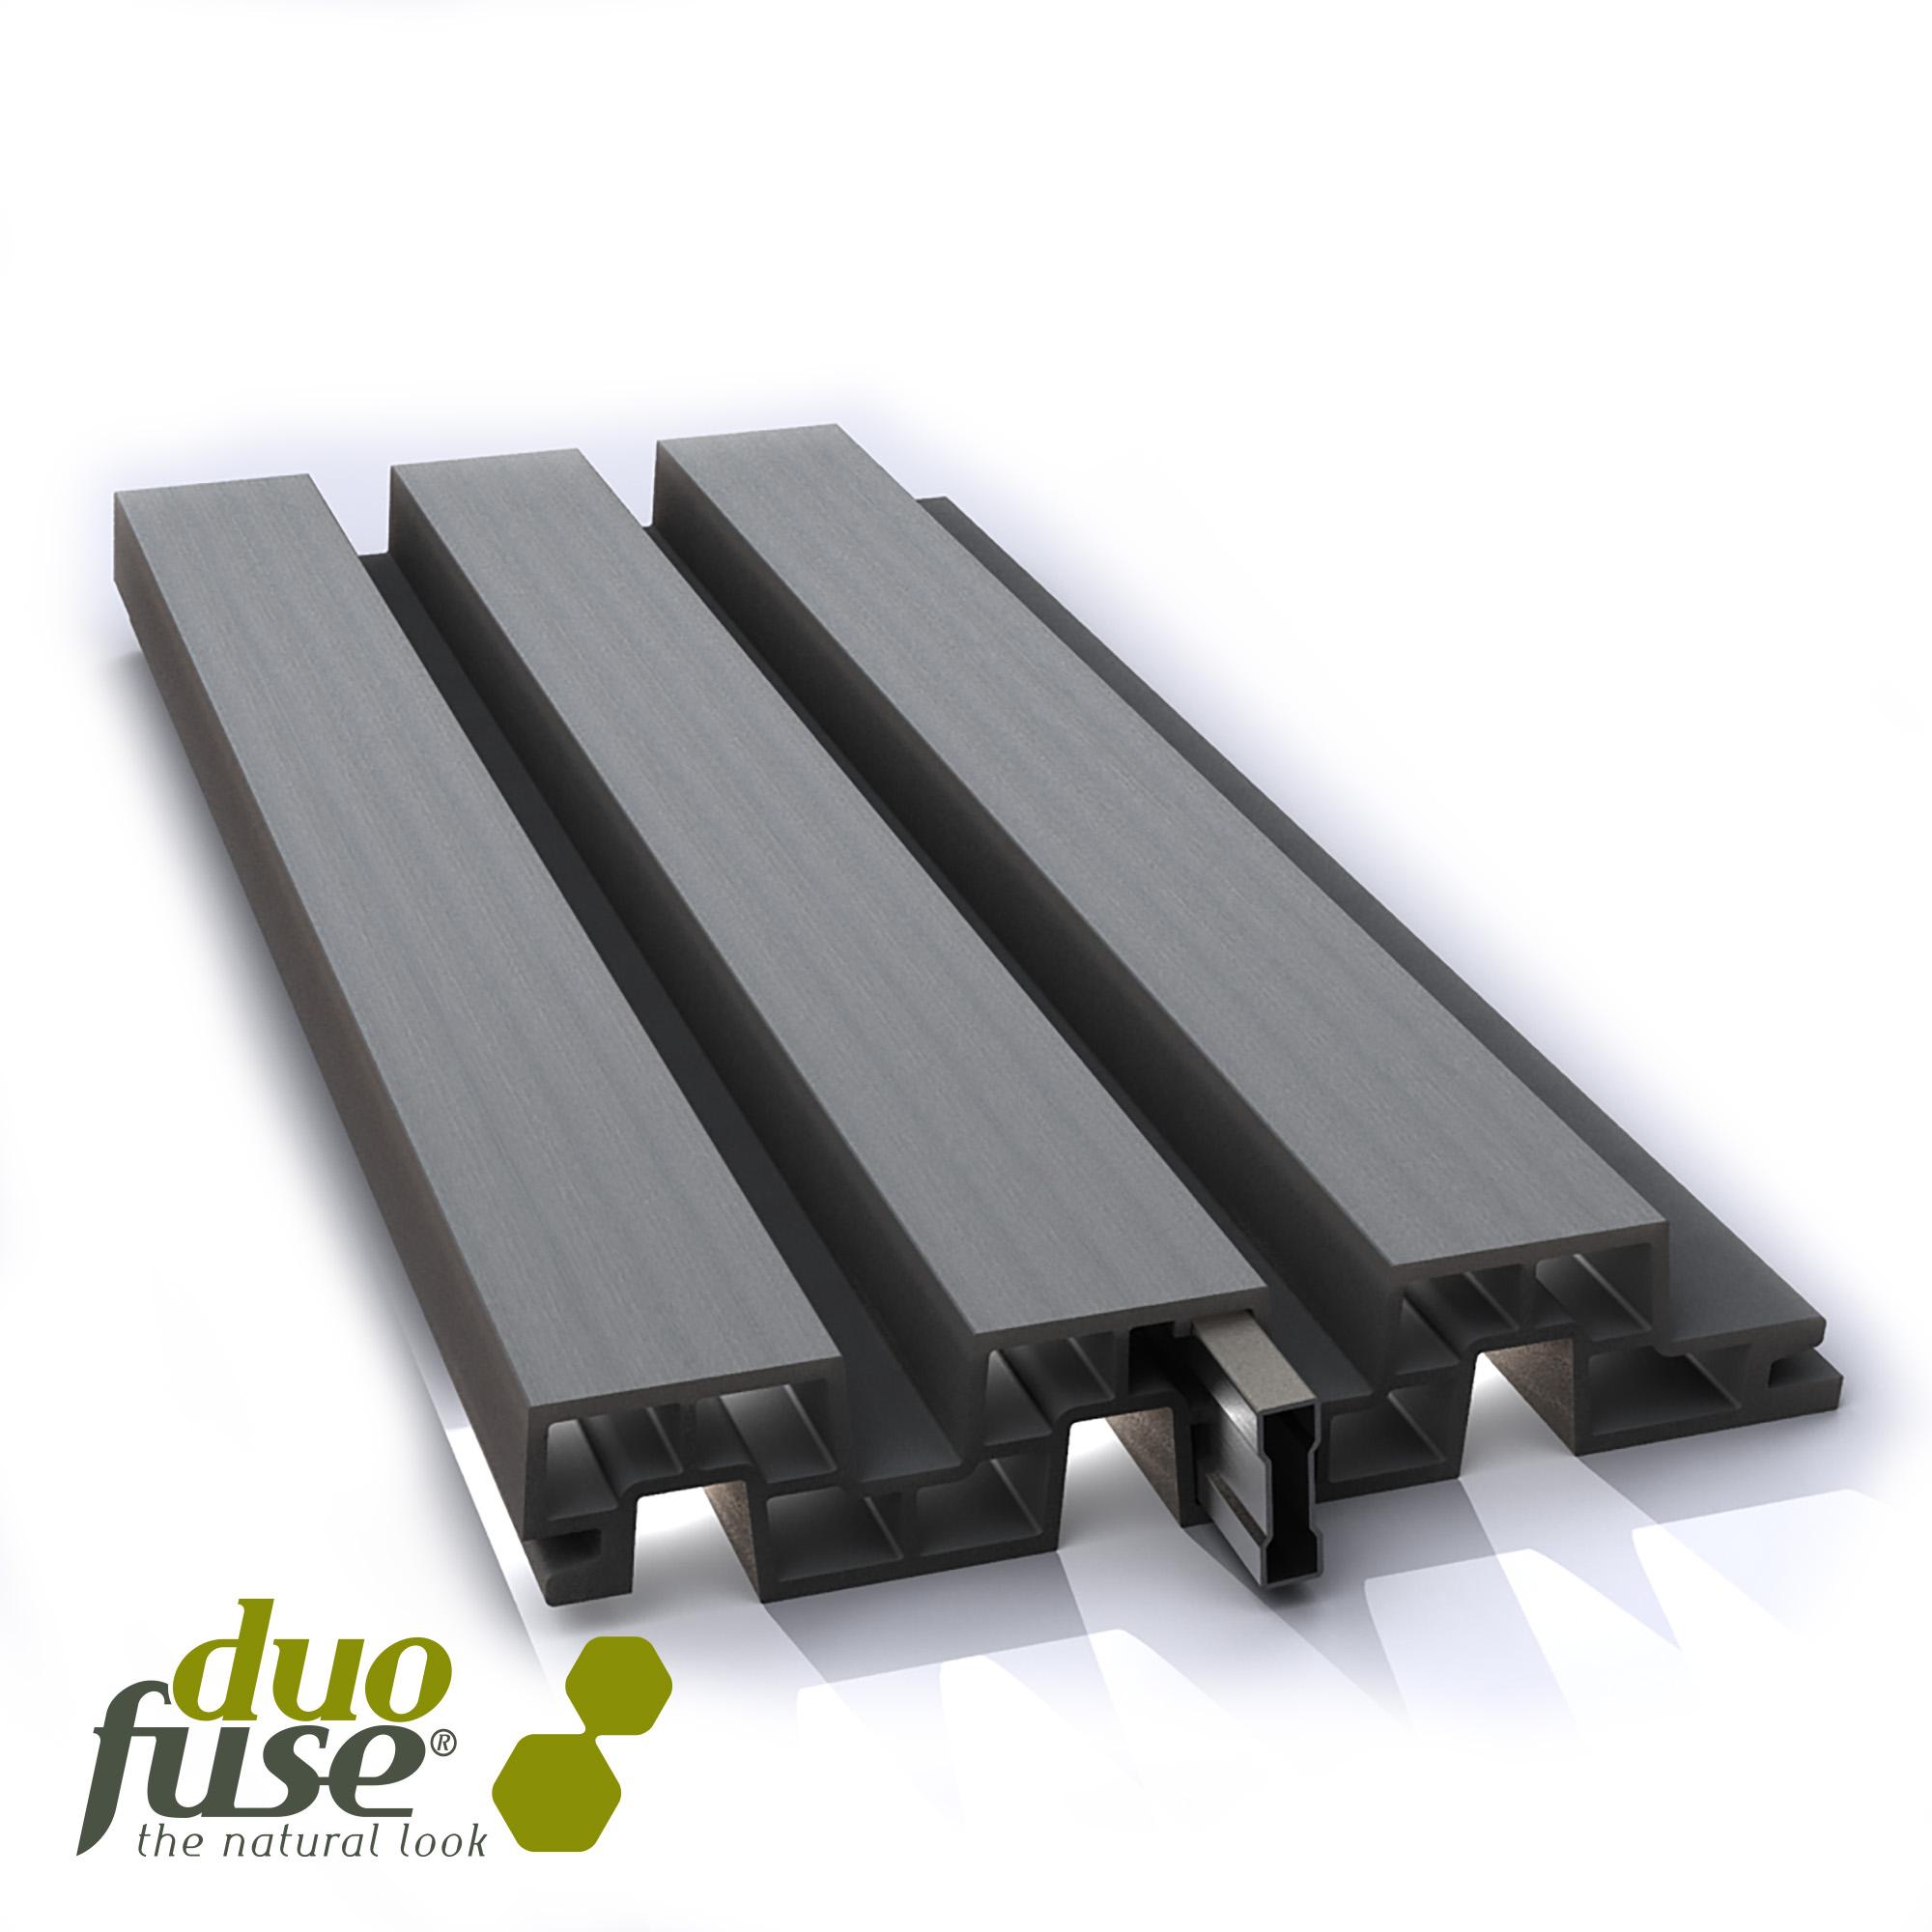 Duofuse | Lamellenafsluiting plank | 200cm | Tropical Brown